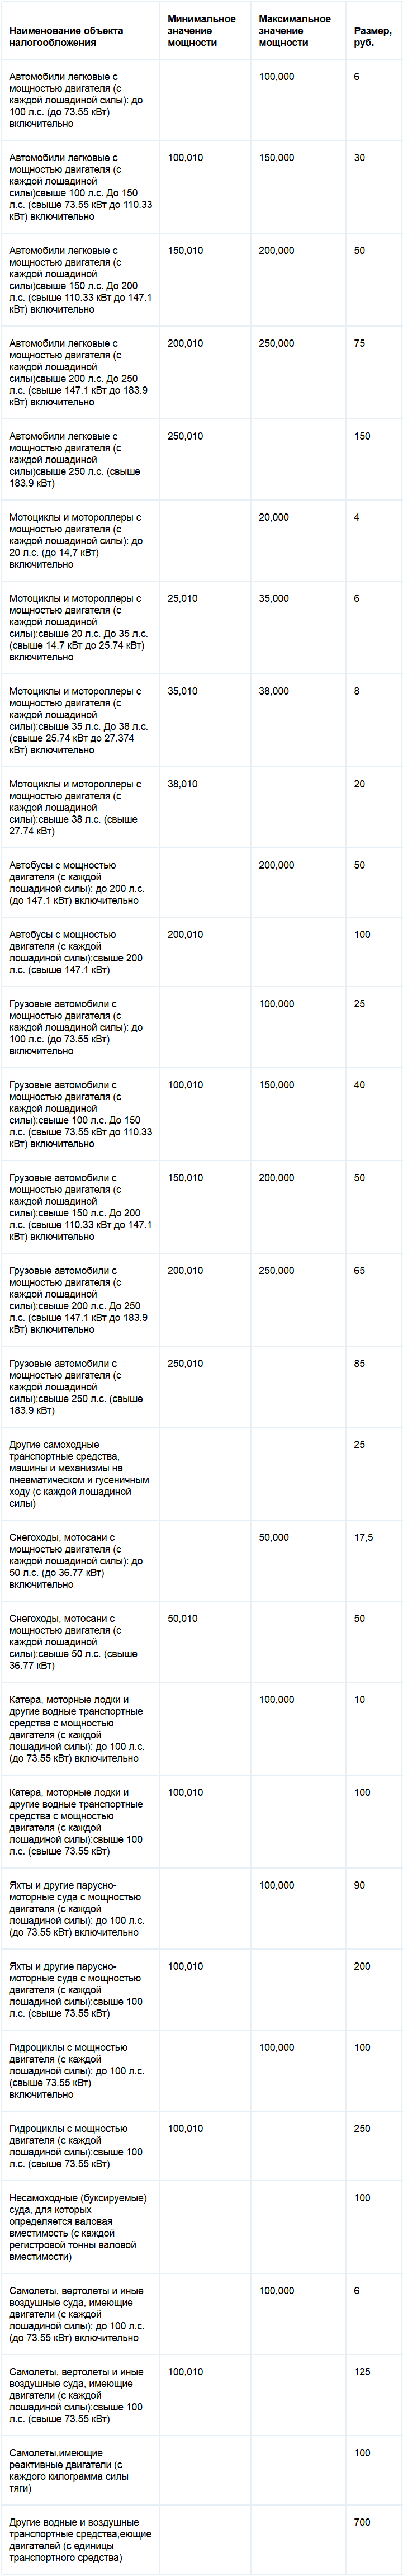 Ставки транспортного налога республики Карелия